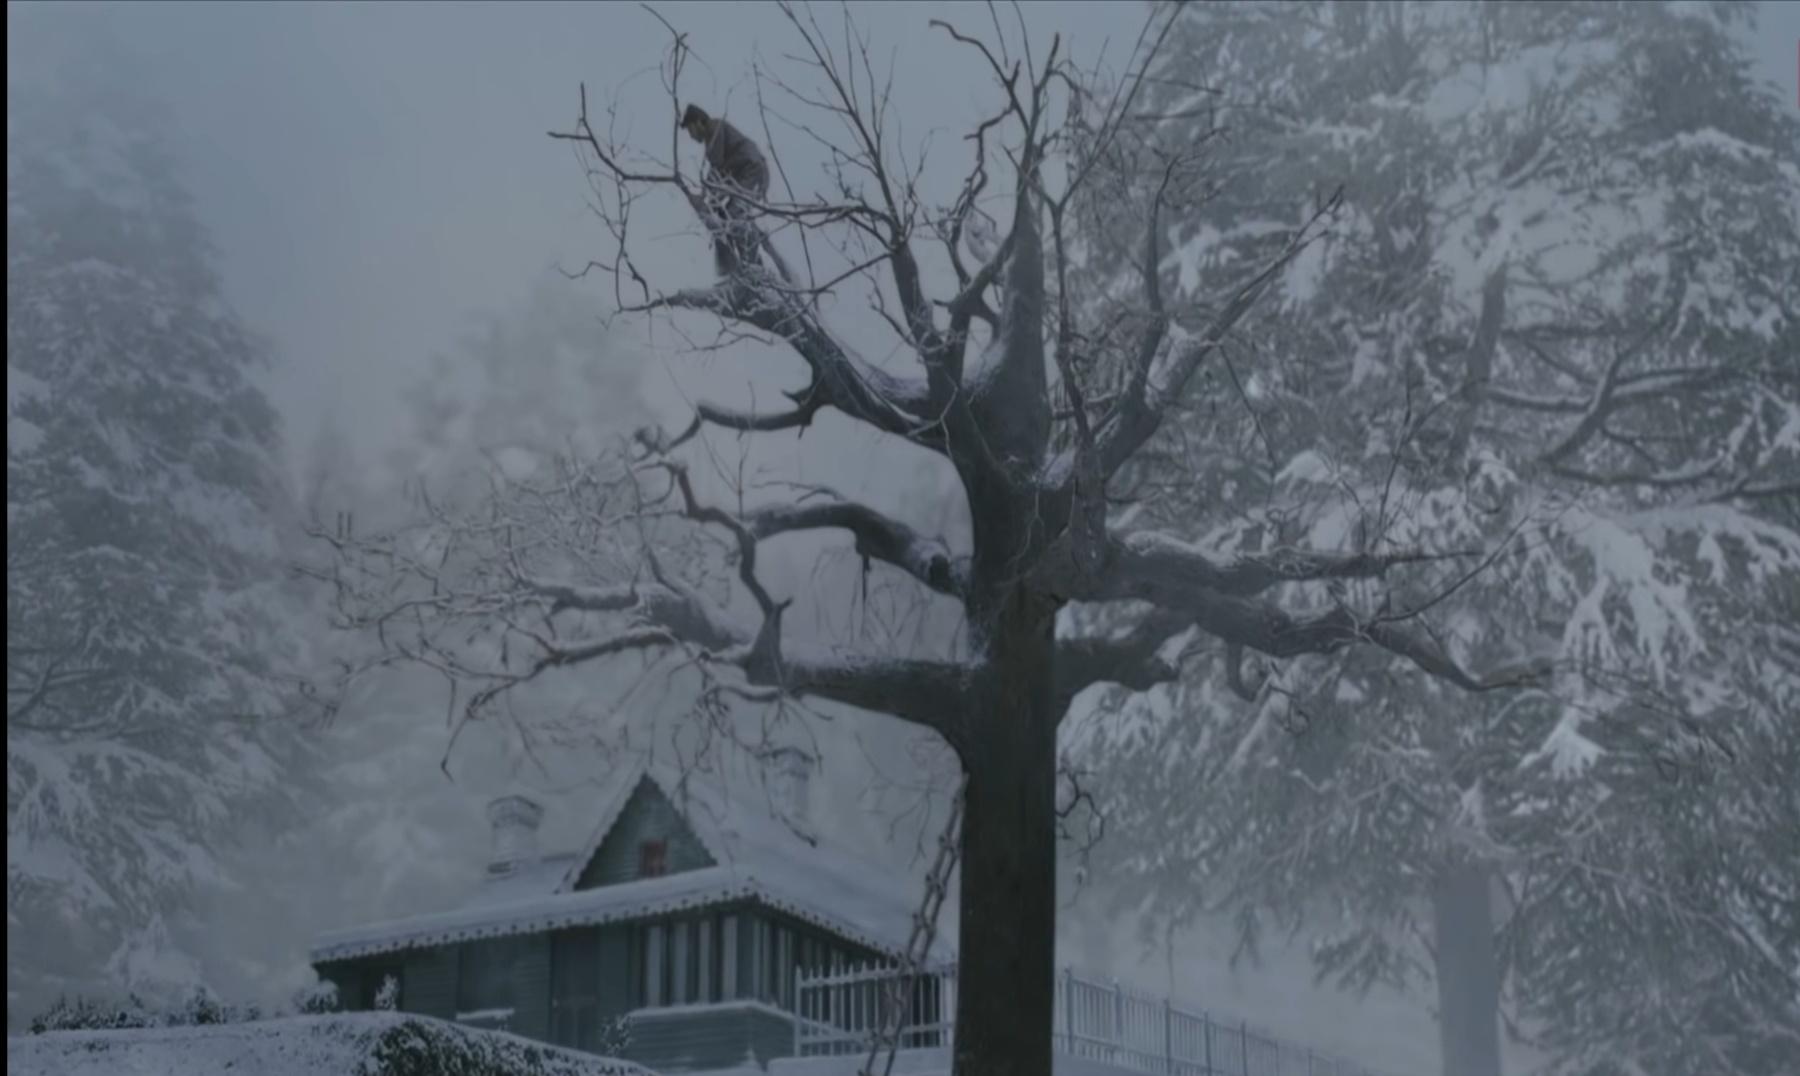 A still from the Hindi film Lootera (2013)